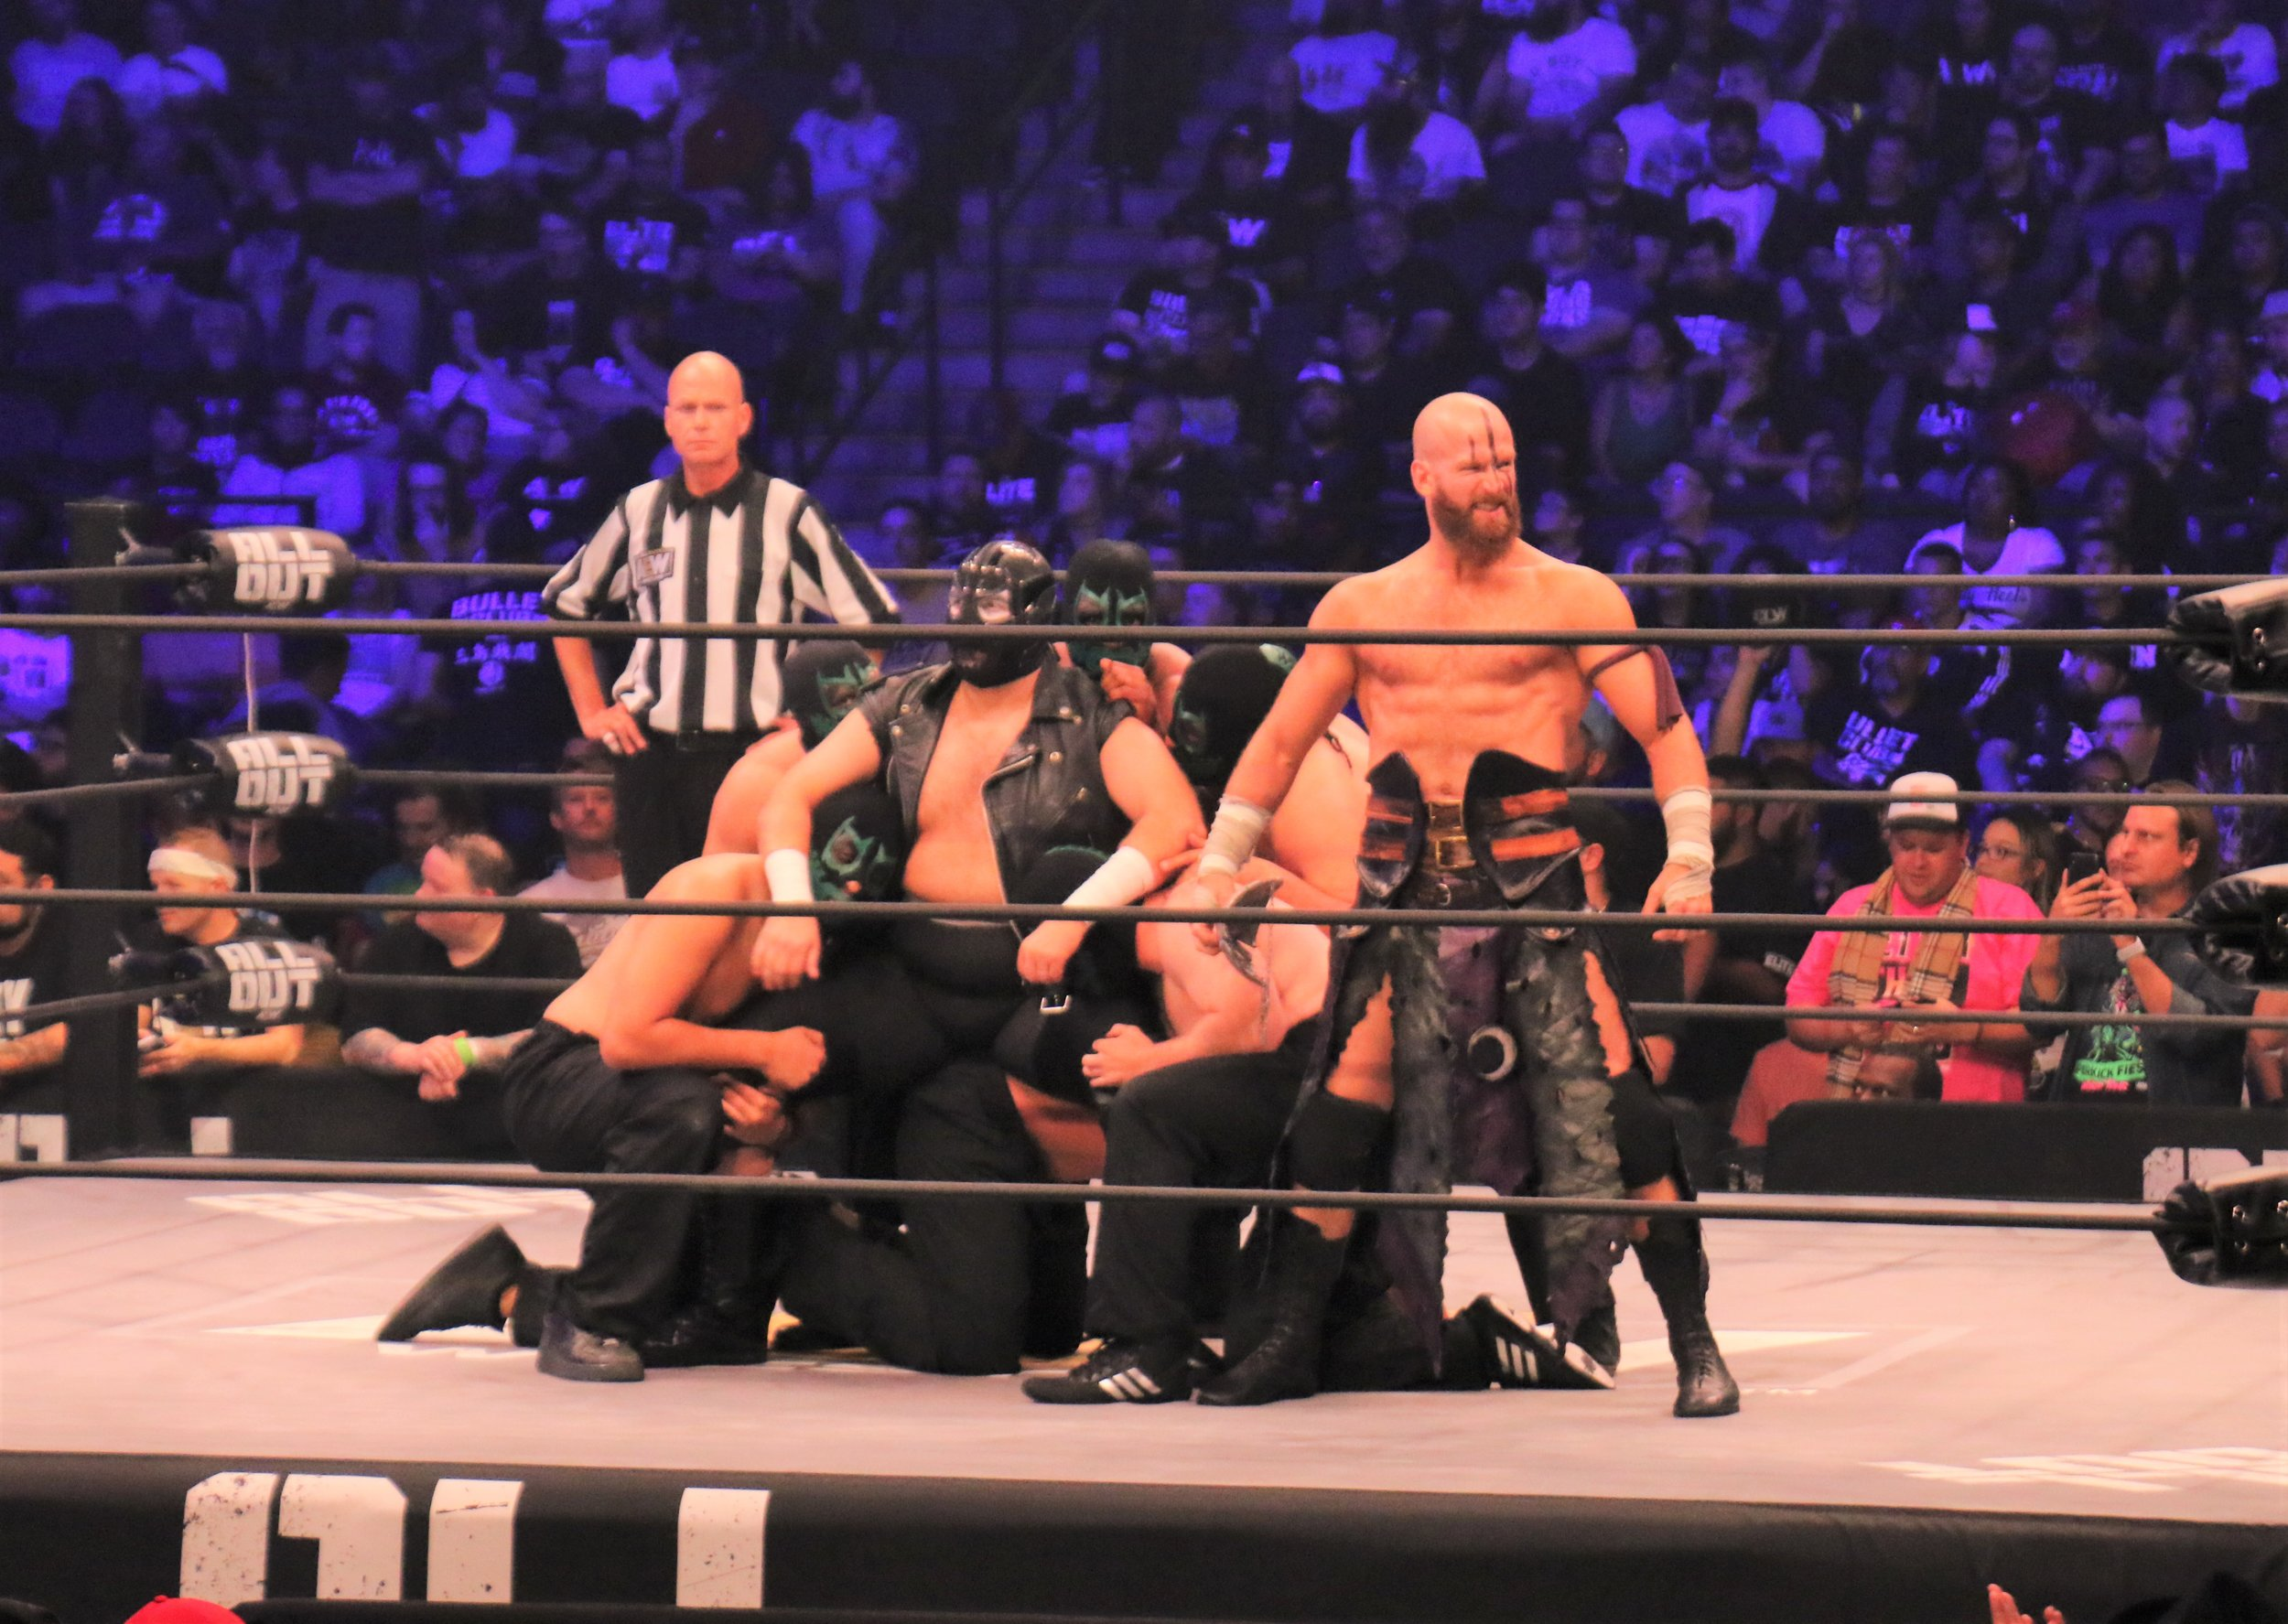 Members of the Dark Order hit the ring.